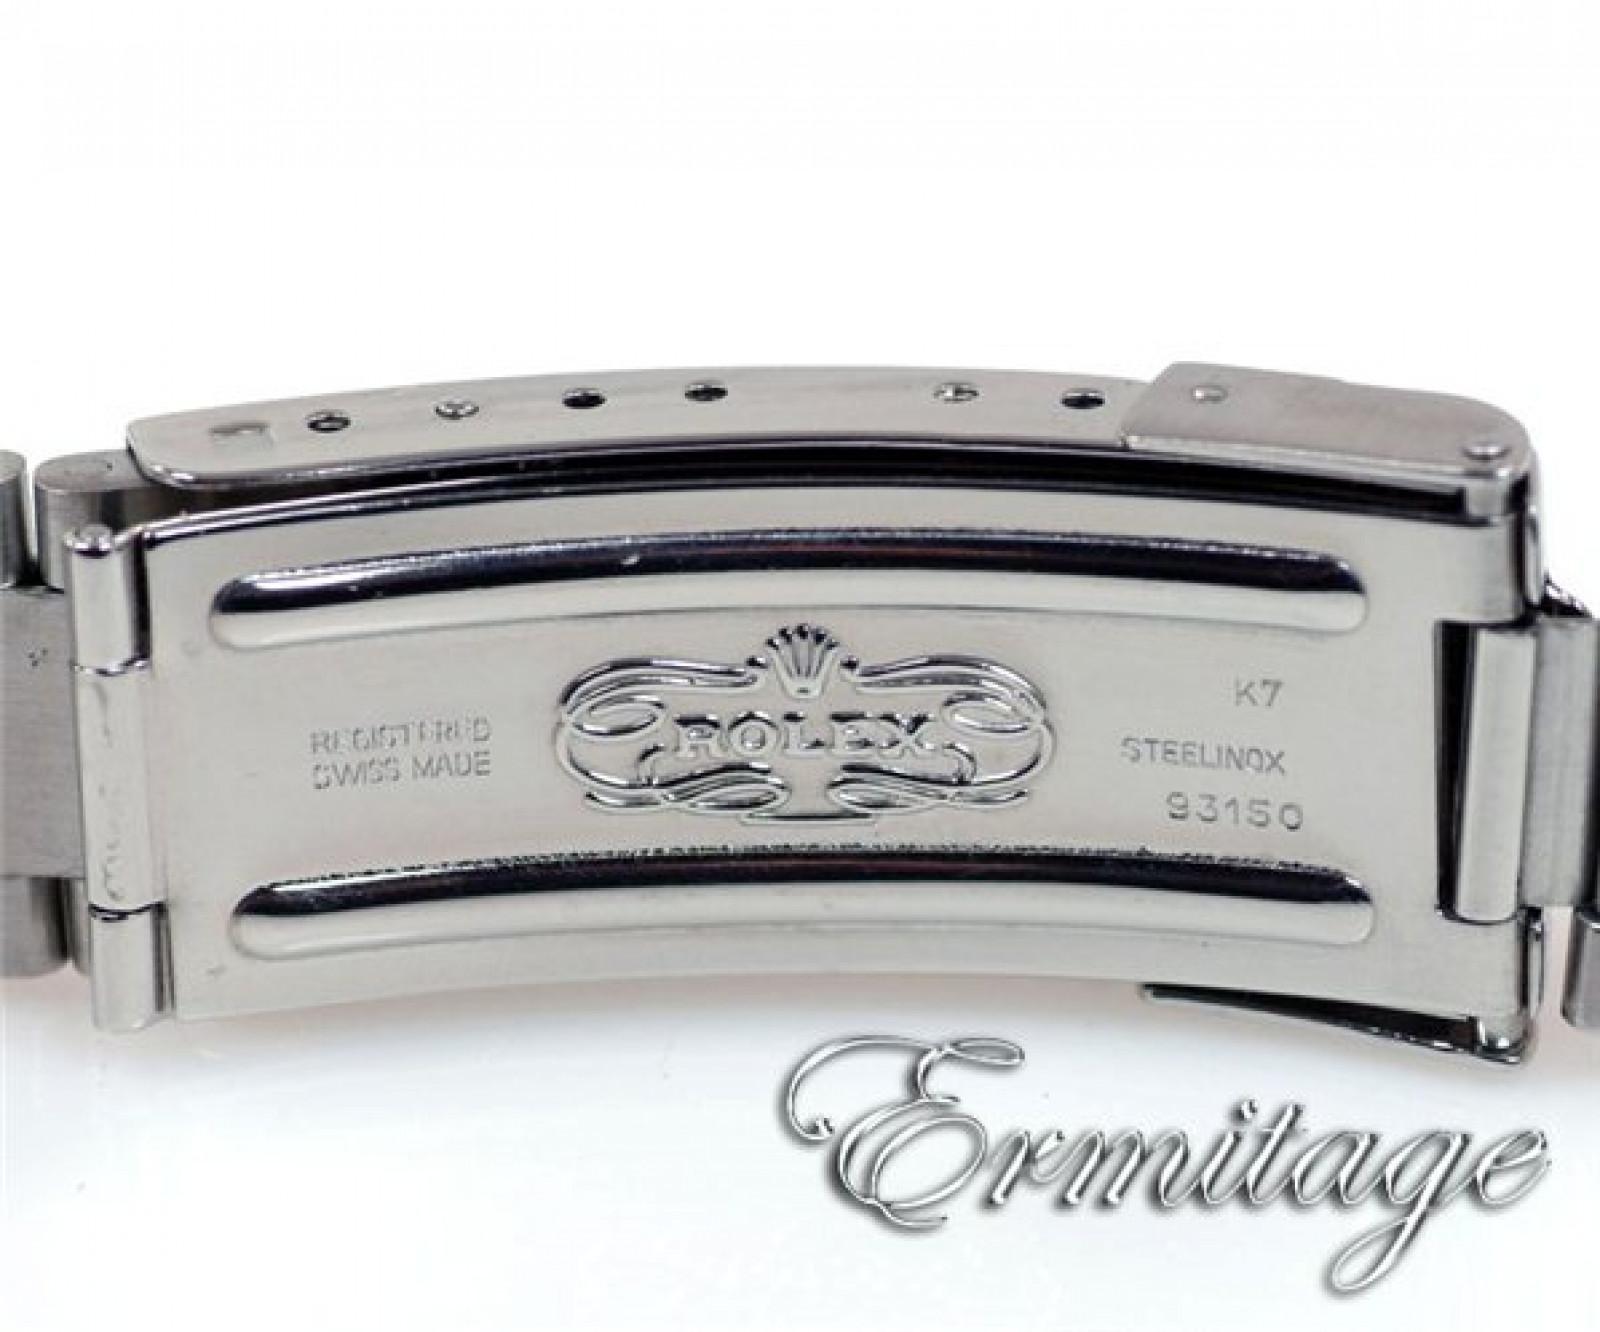 Vintage Rolex Submariner 1680 Steel with Black Dial